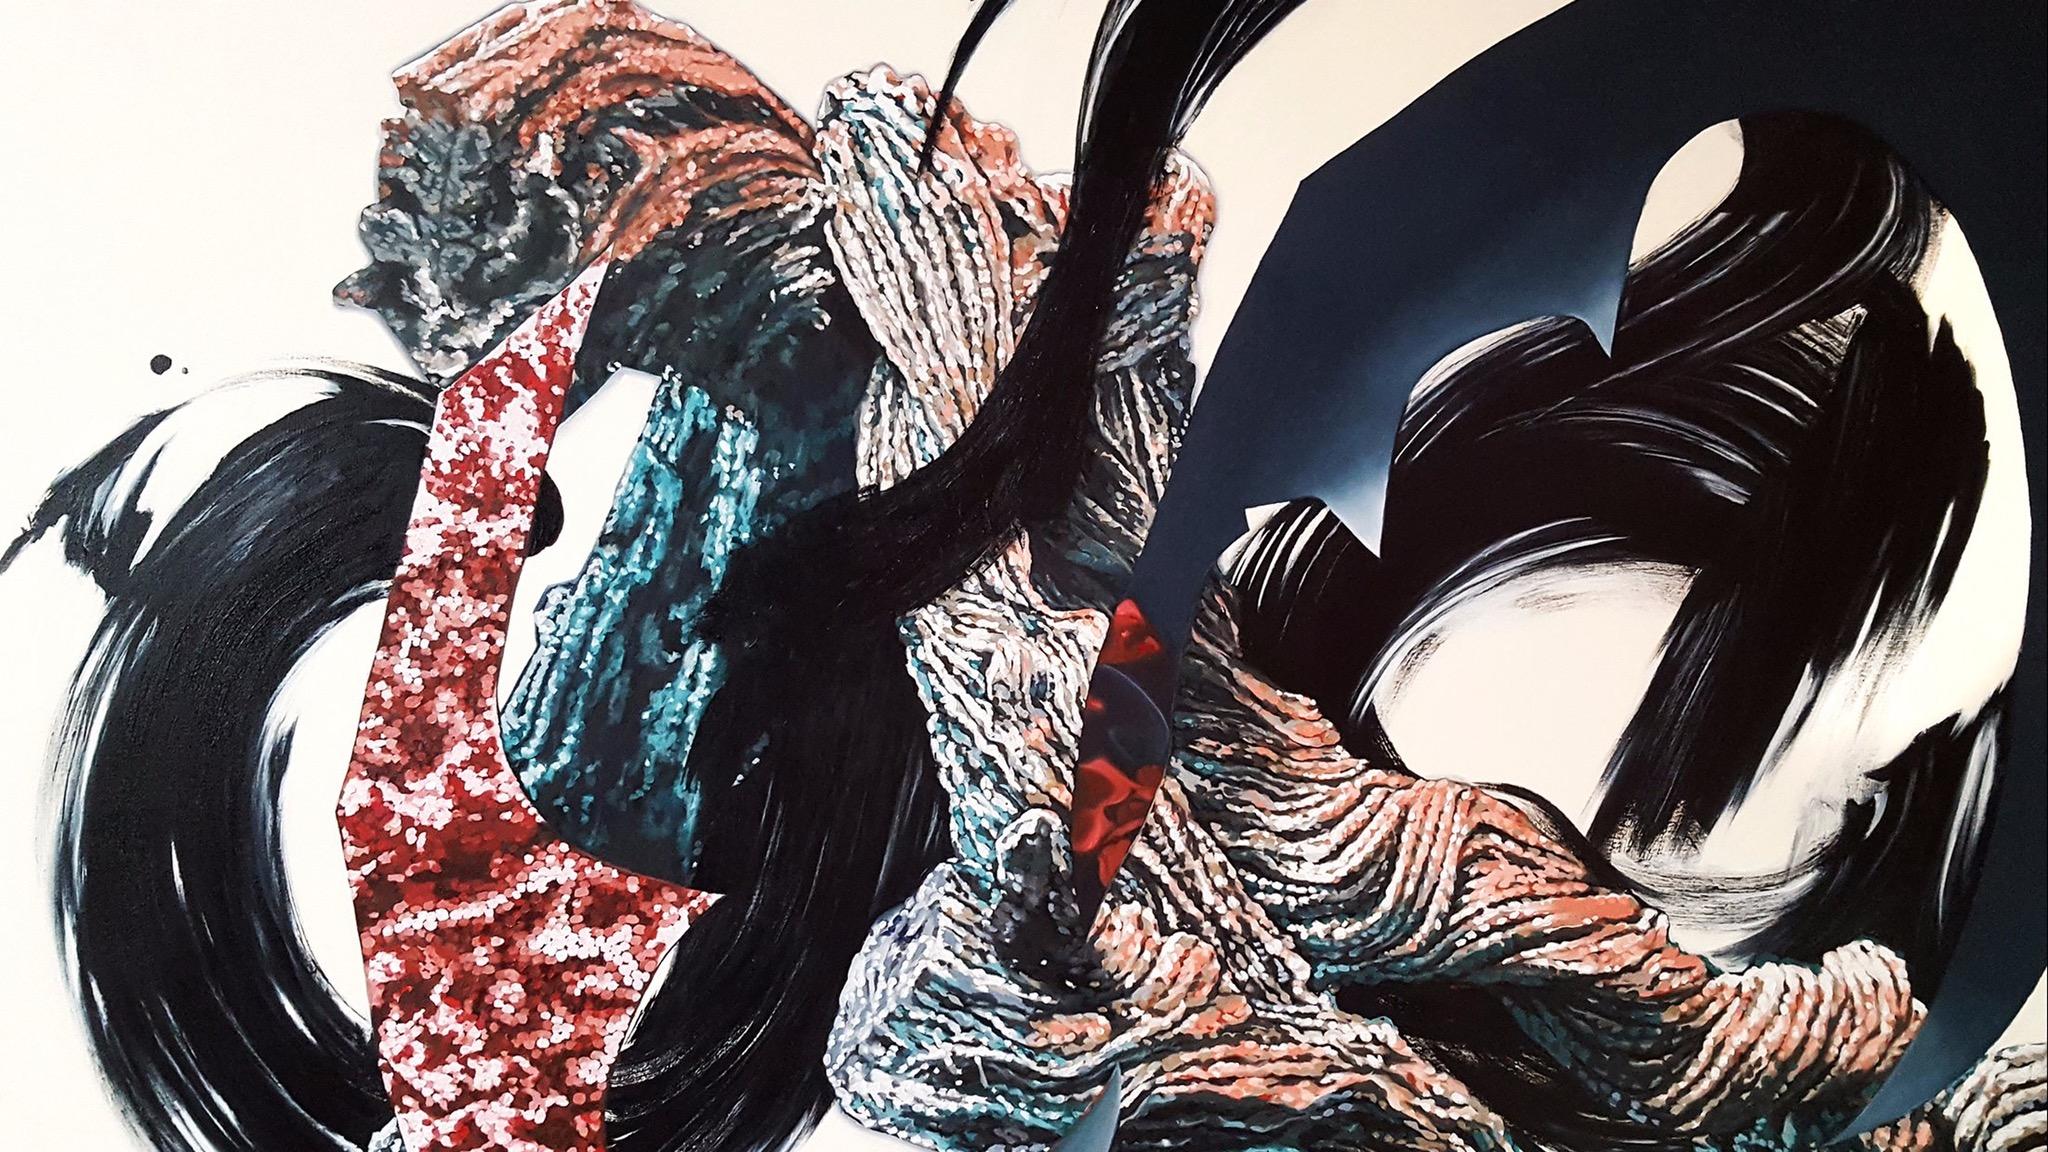 Image: Eliza Cameron, Dragon Snap, oil on canvas, 150 x 106cm